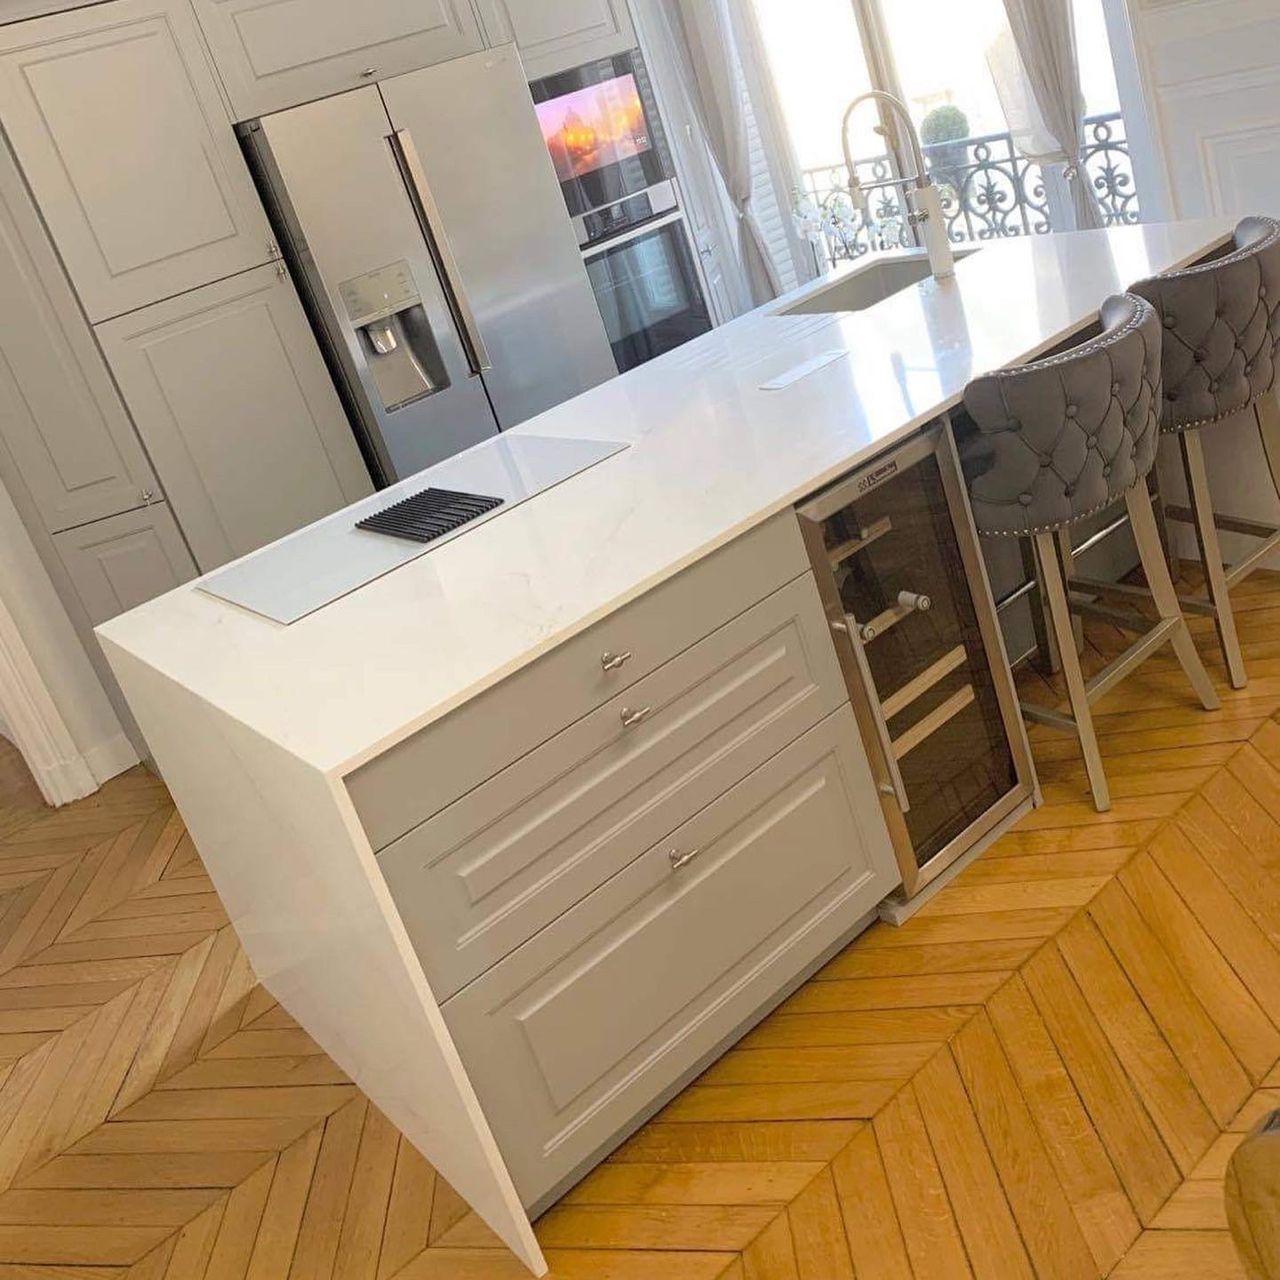 Plan-travail-cuisine-design-marbrerie-silestone-STC-Paris